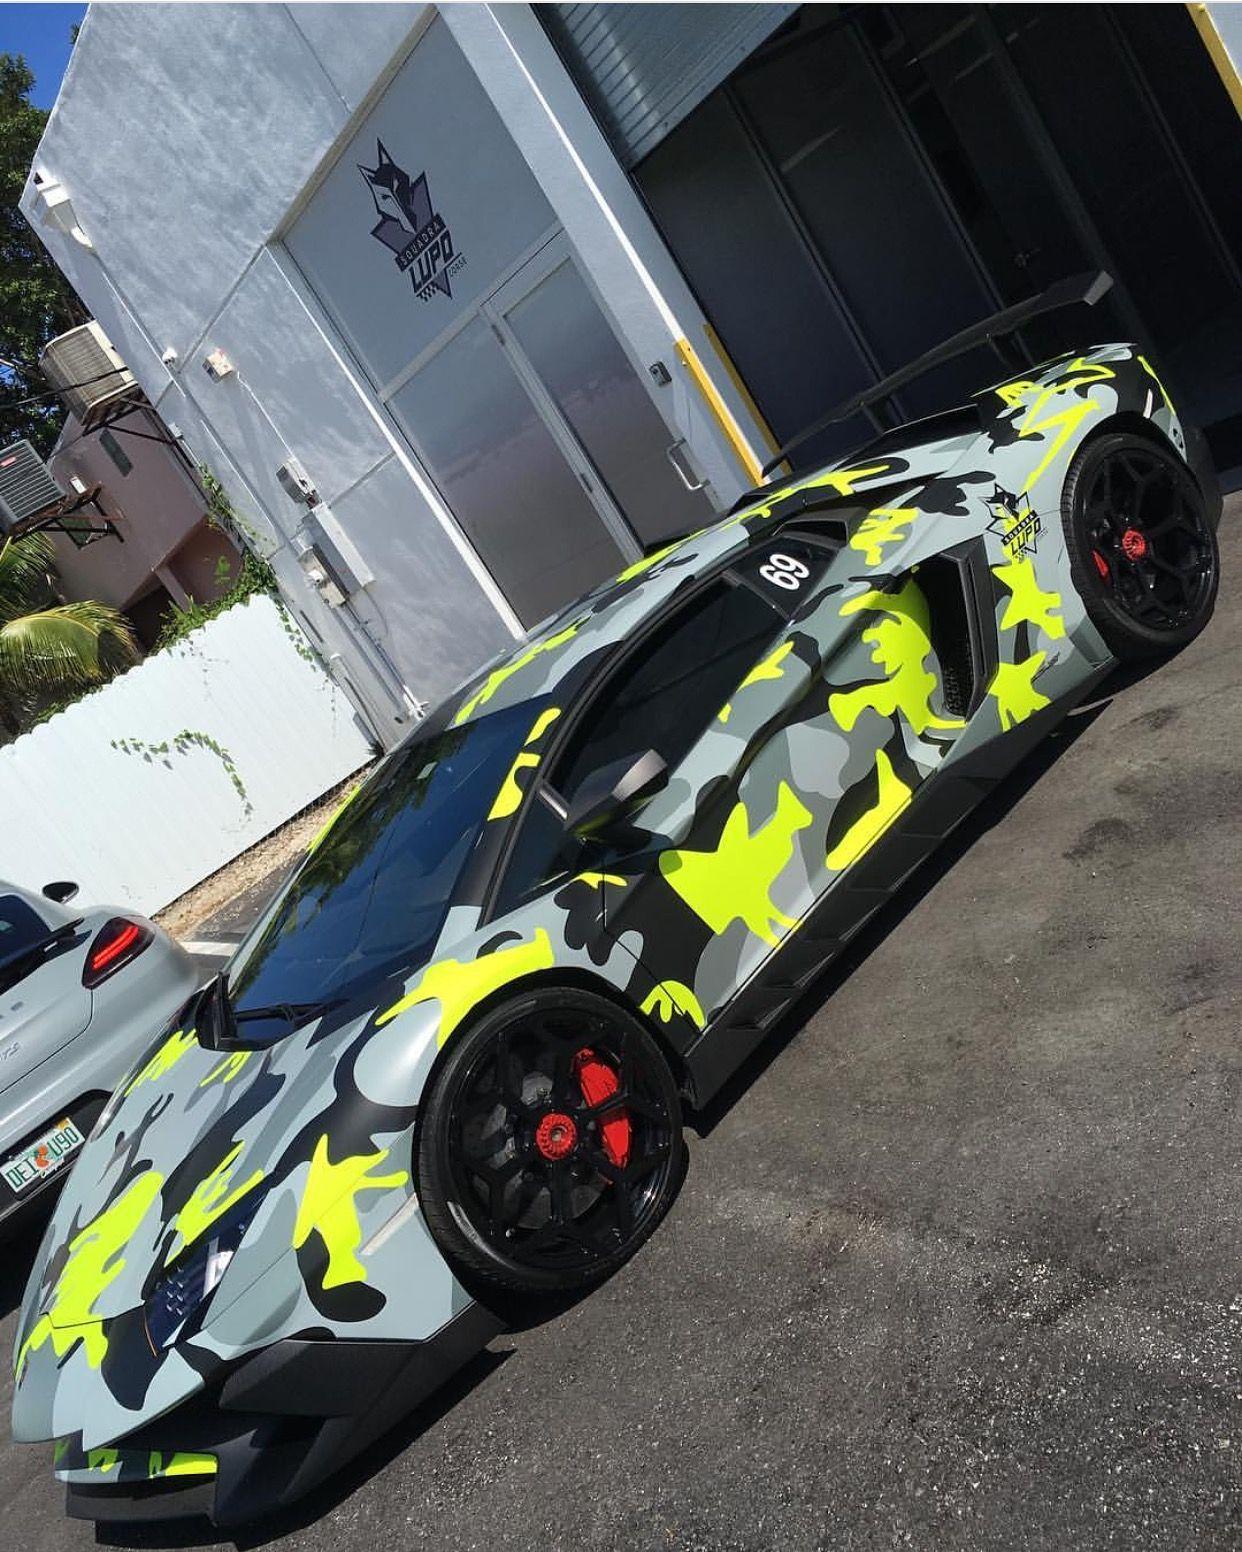 Lamborghini Aventador Super Veloce Coupe Painted In Giallo Orion And  Wrapped In Camo W/ A